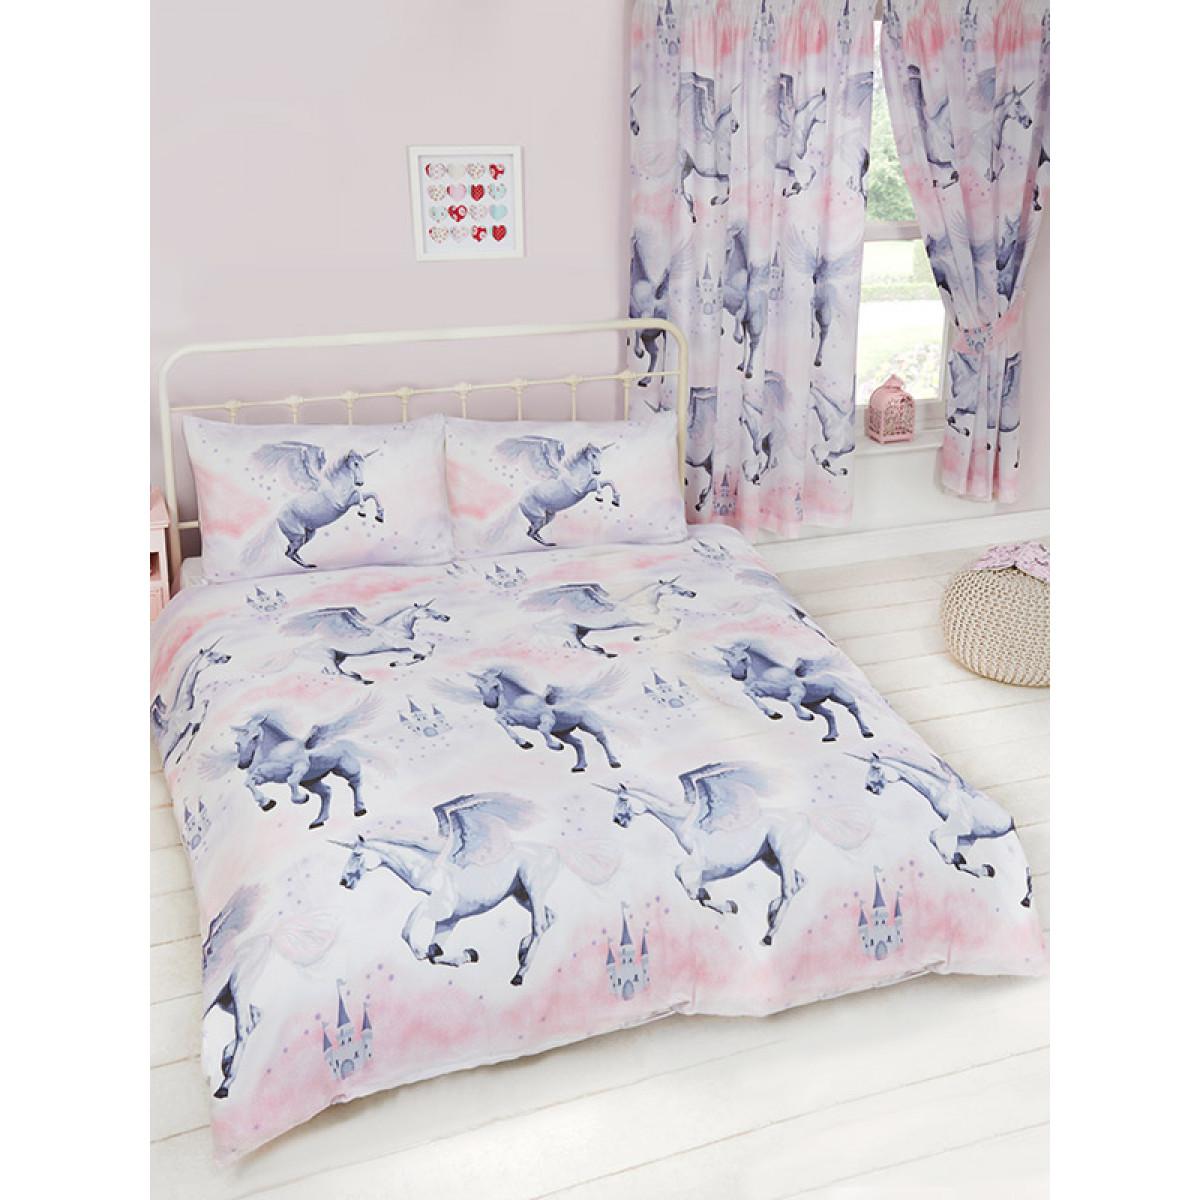 pink stardust unicorn double duvet cover pillowcase. Black Bedroom Furniture Sets. Home Design Ideas